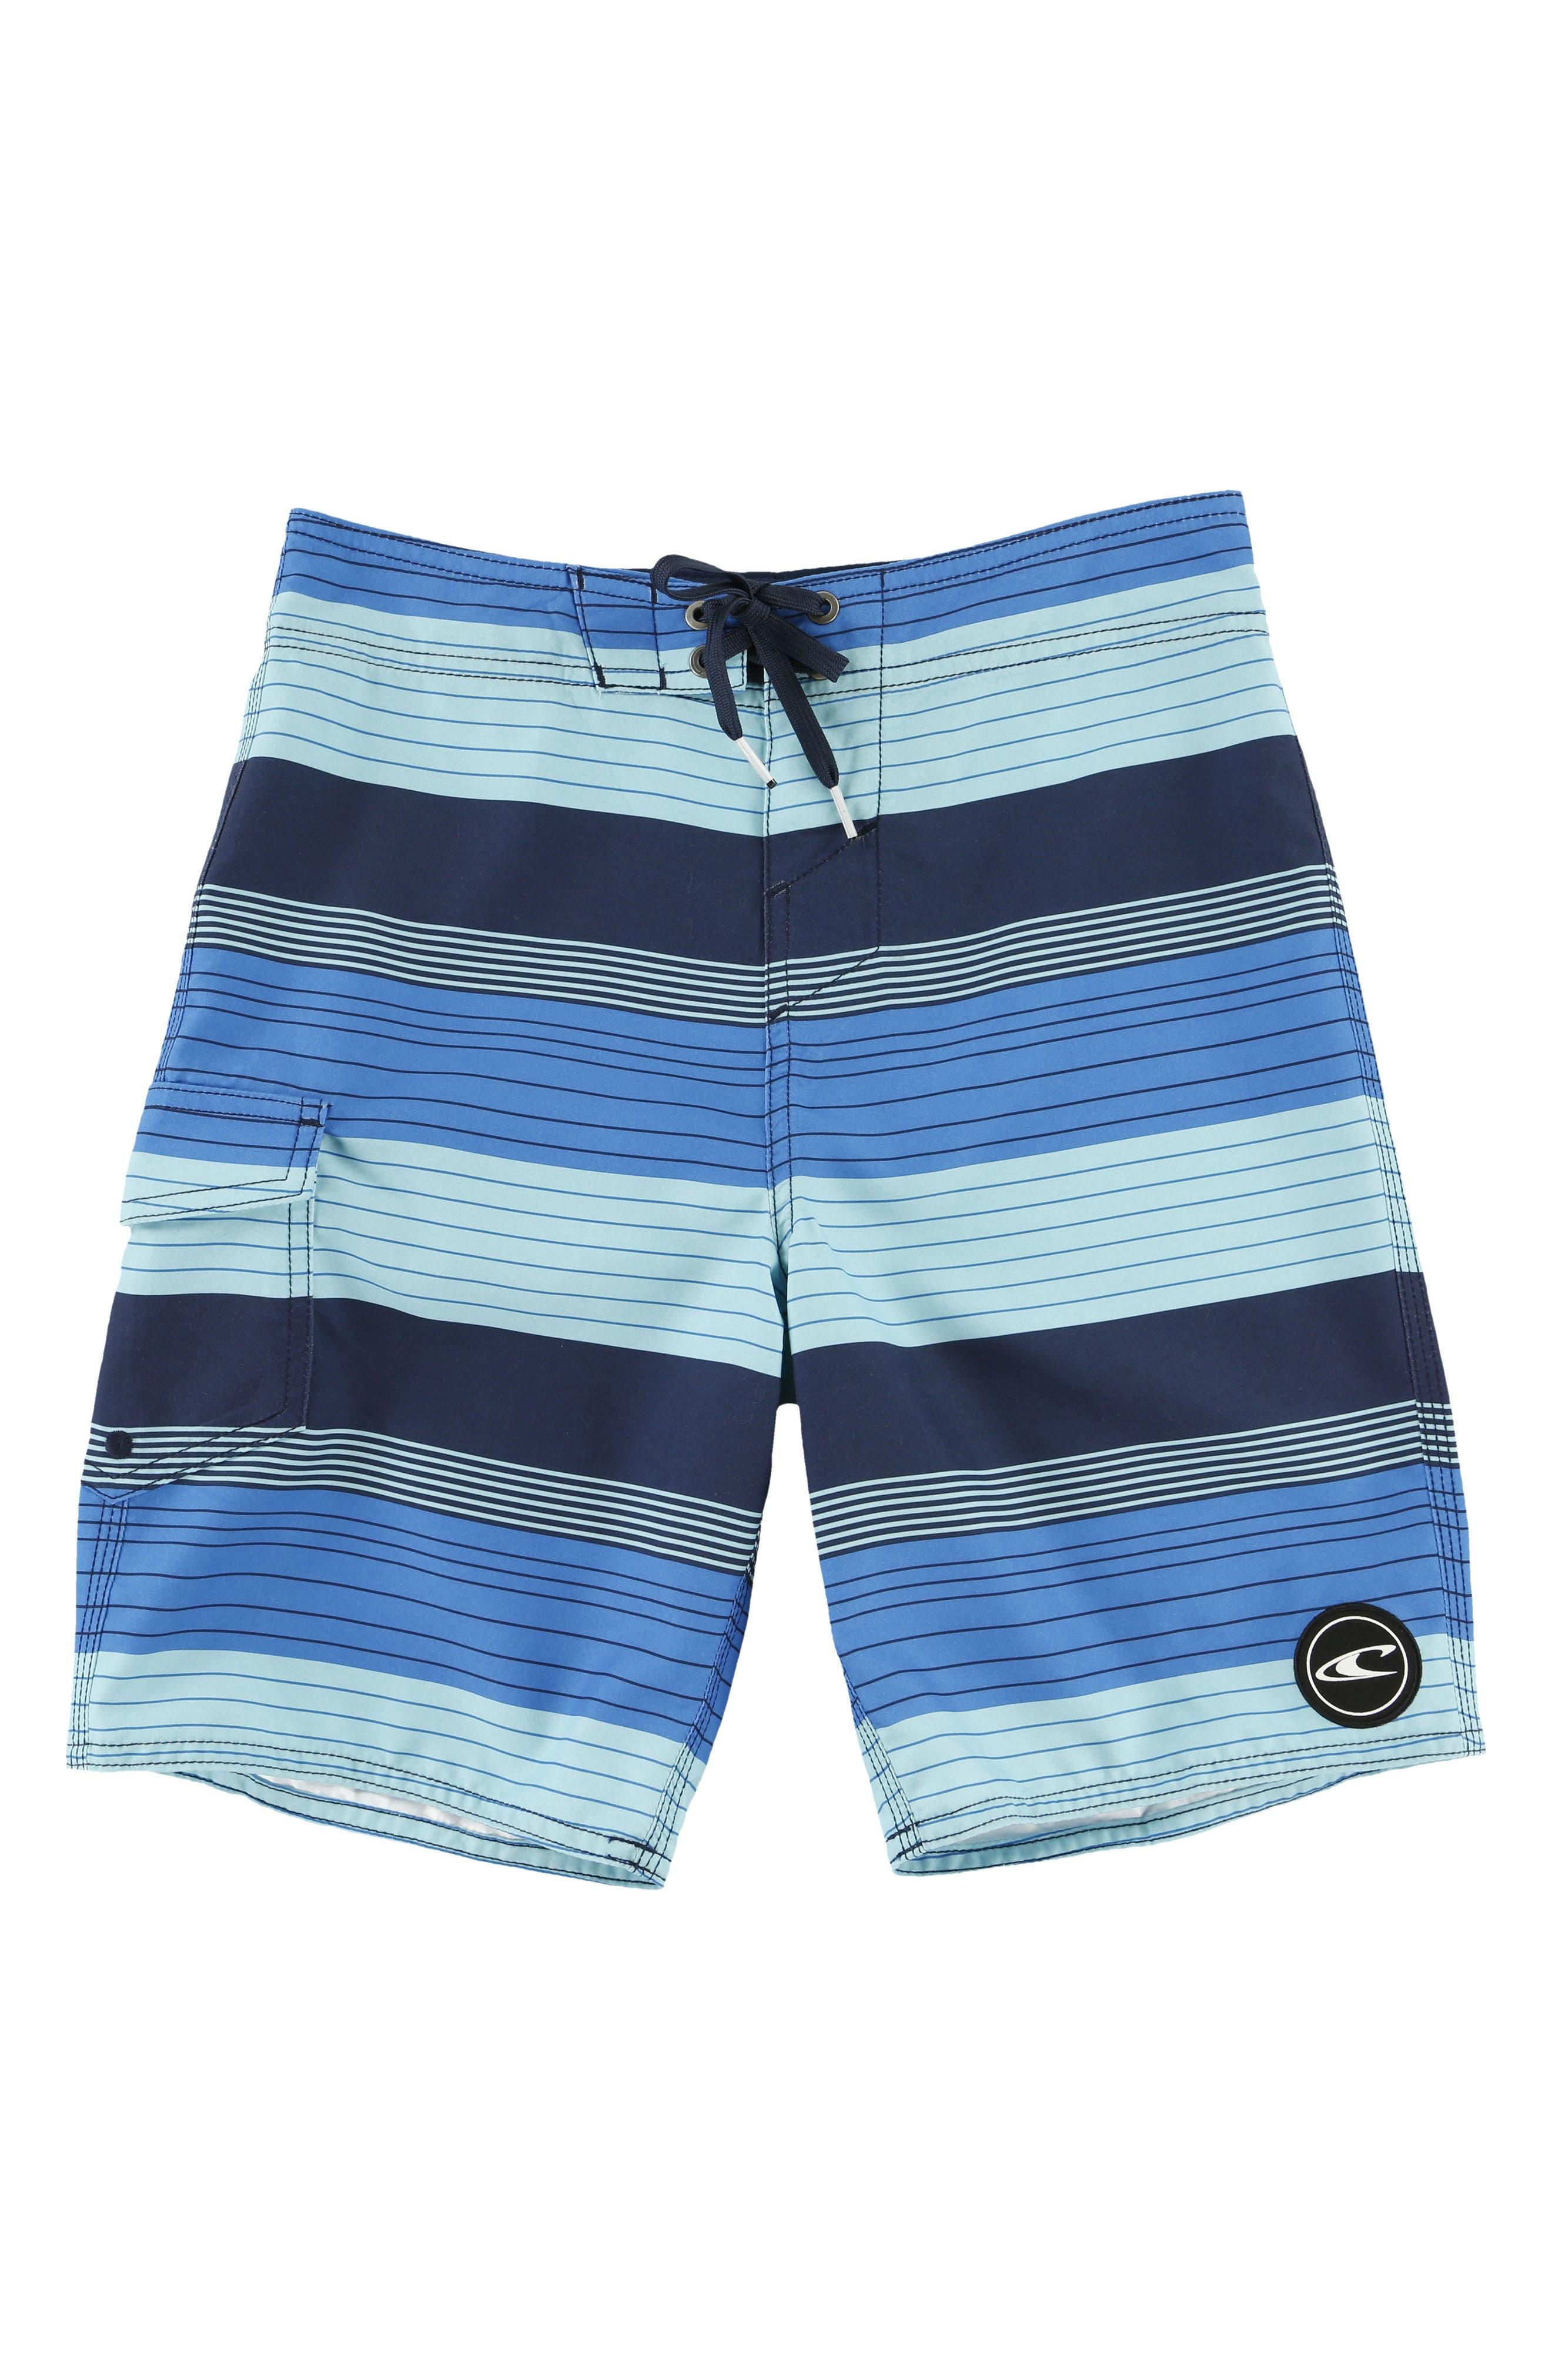 Santa Cruz Stripe Board Shorts,                         Main,                         color, Navy